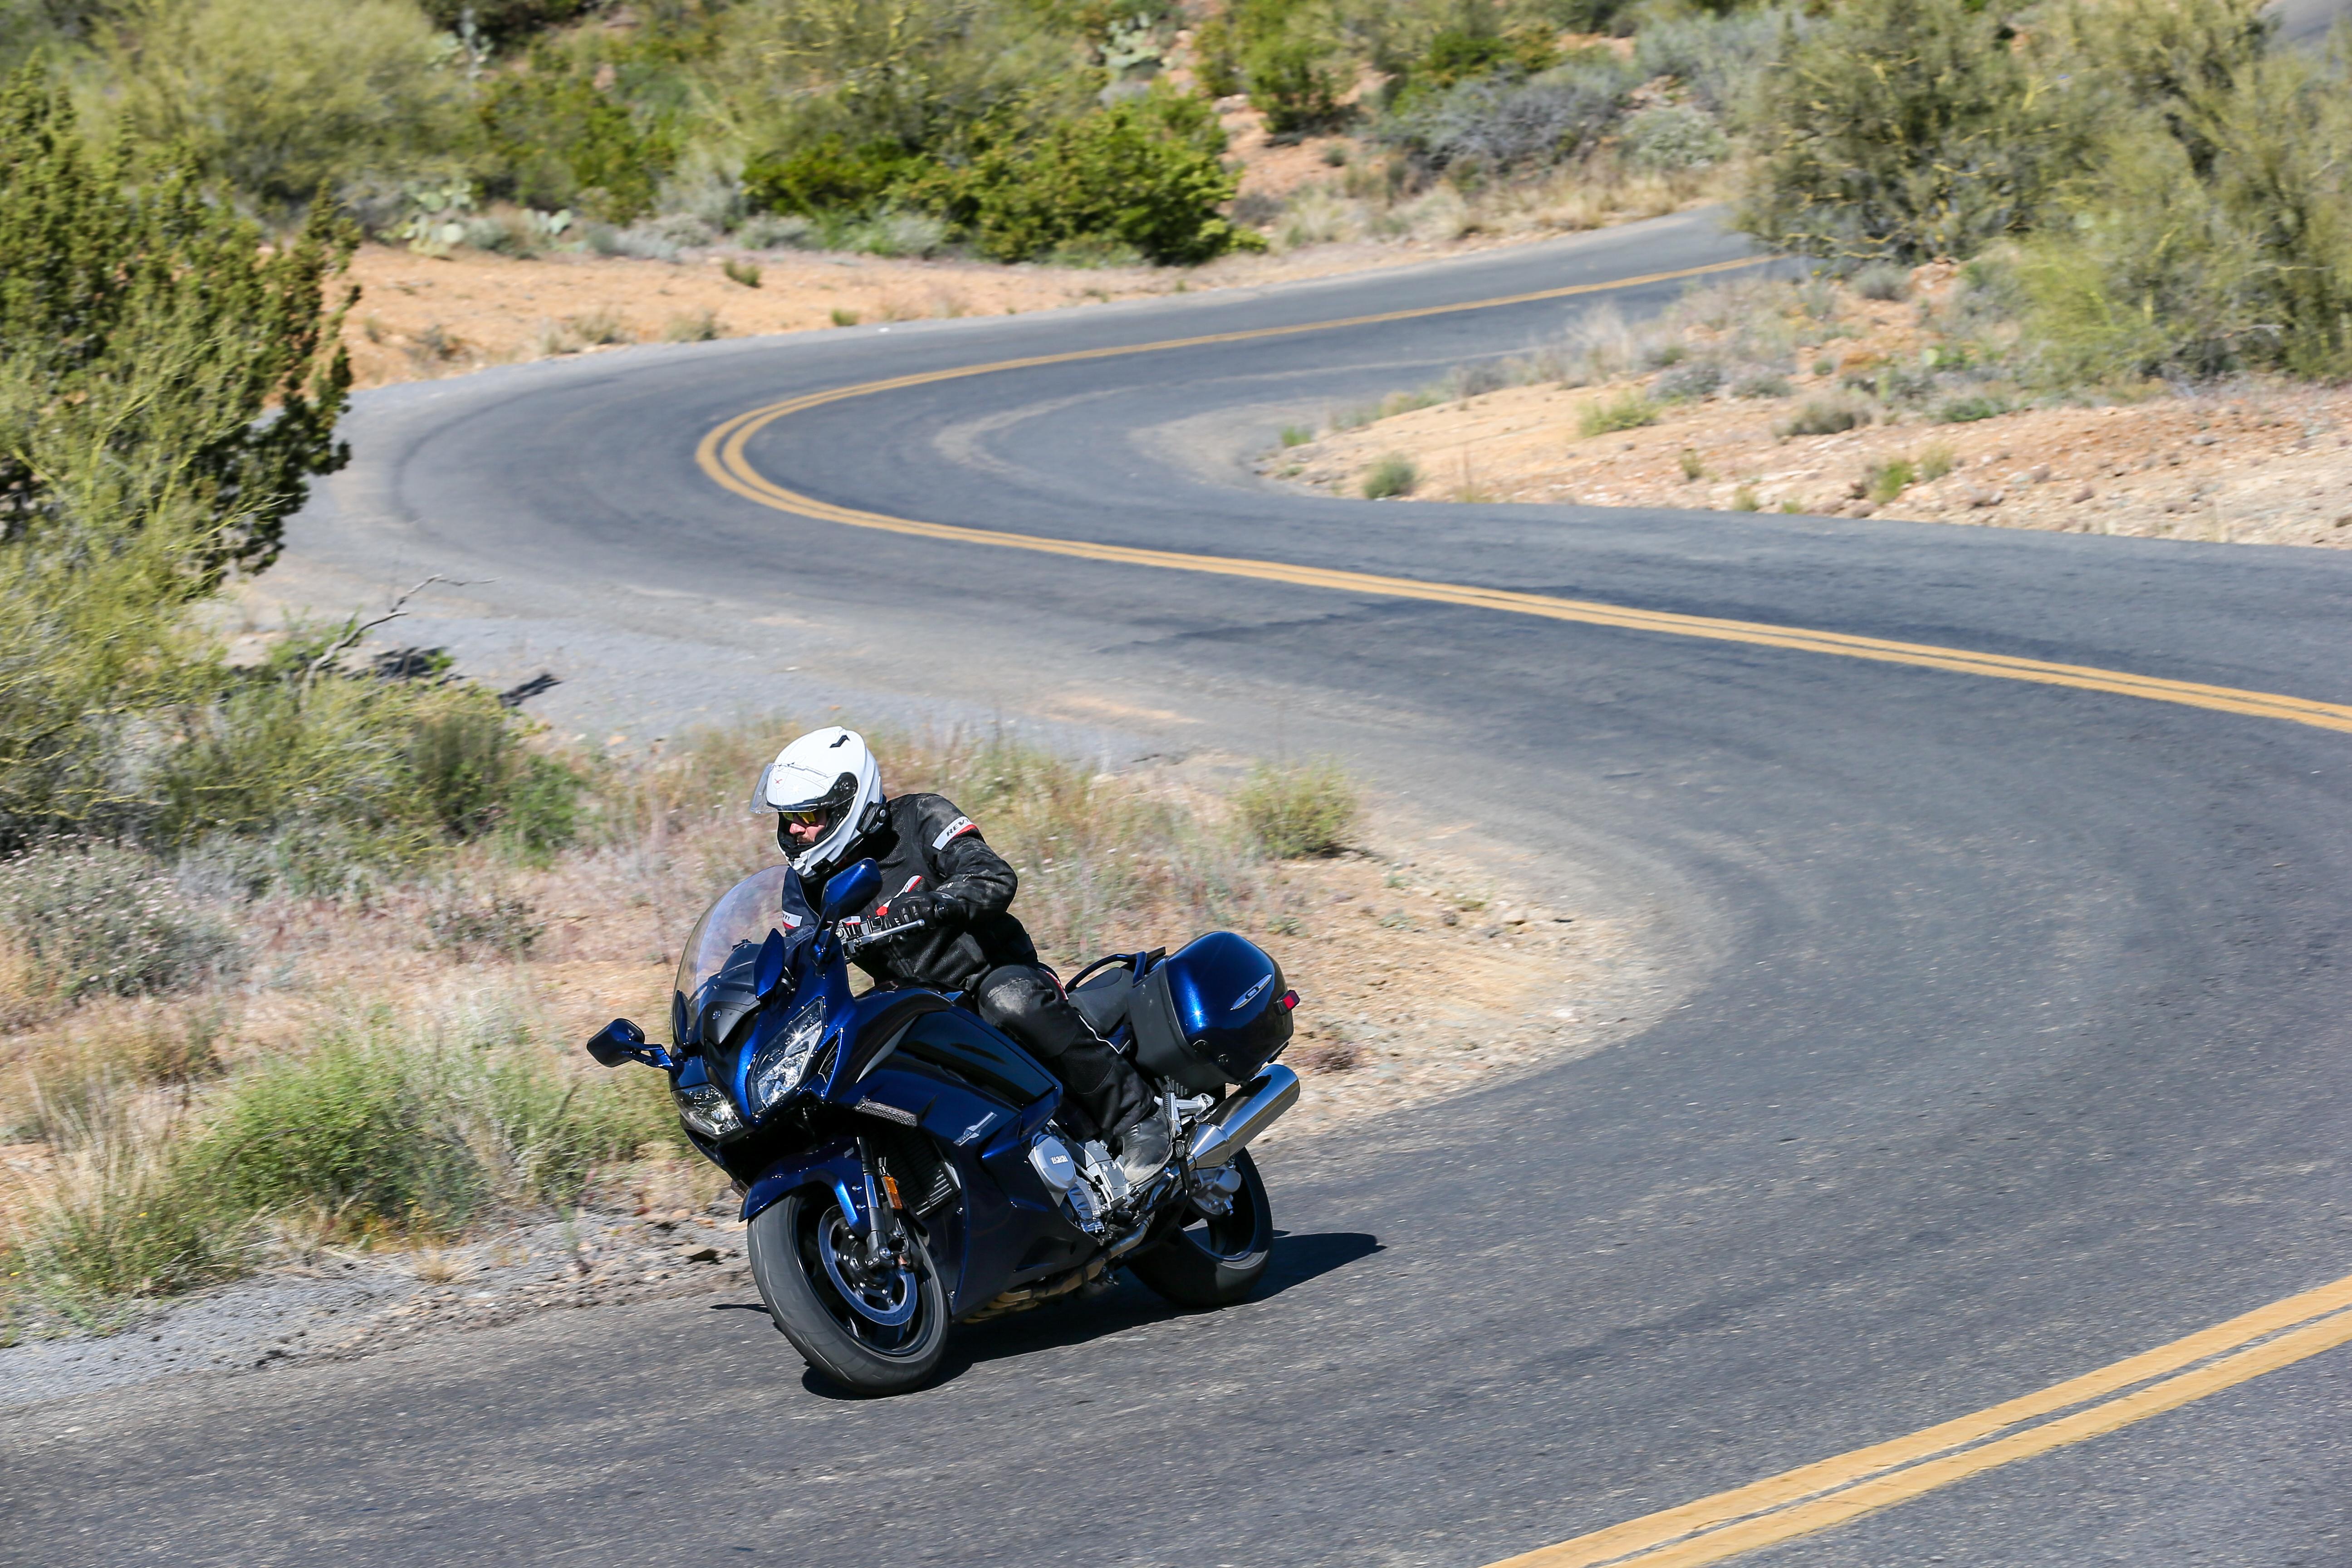 2016 Yamaha FJR1300 first ride review - RevZilla